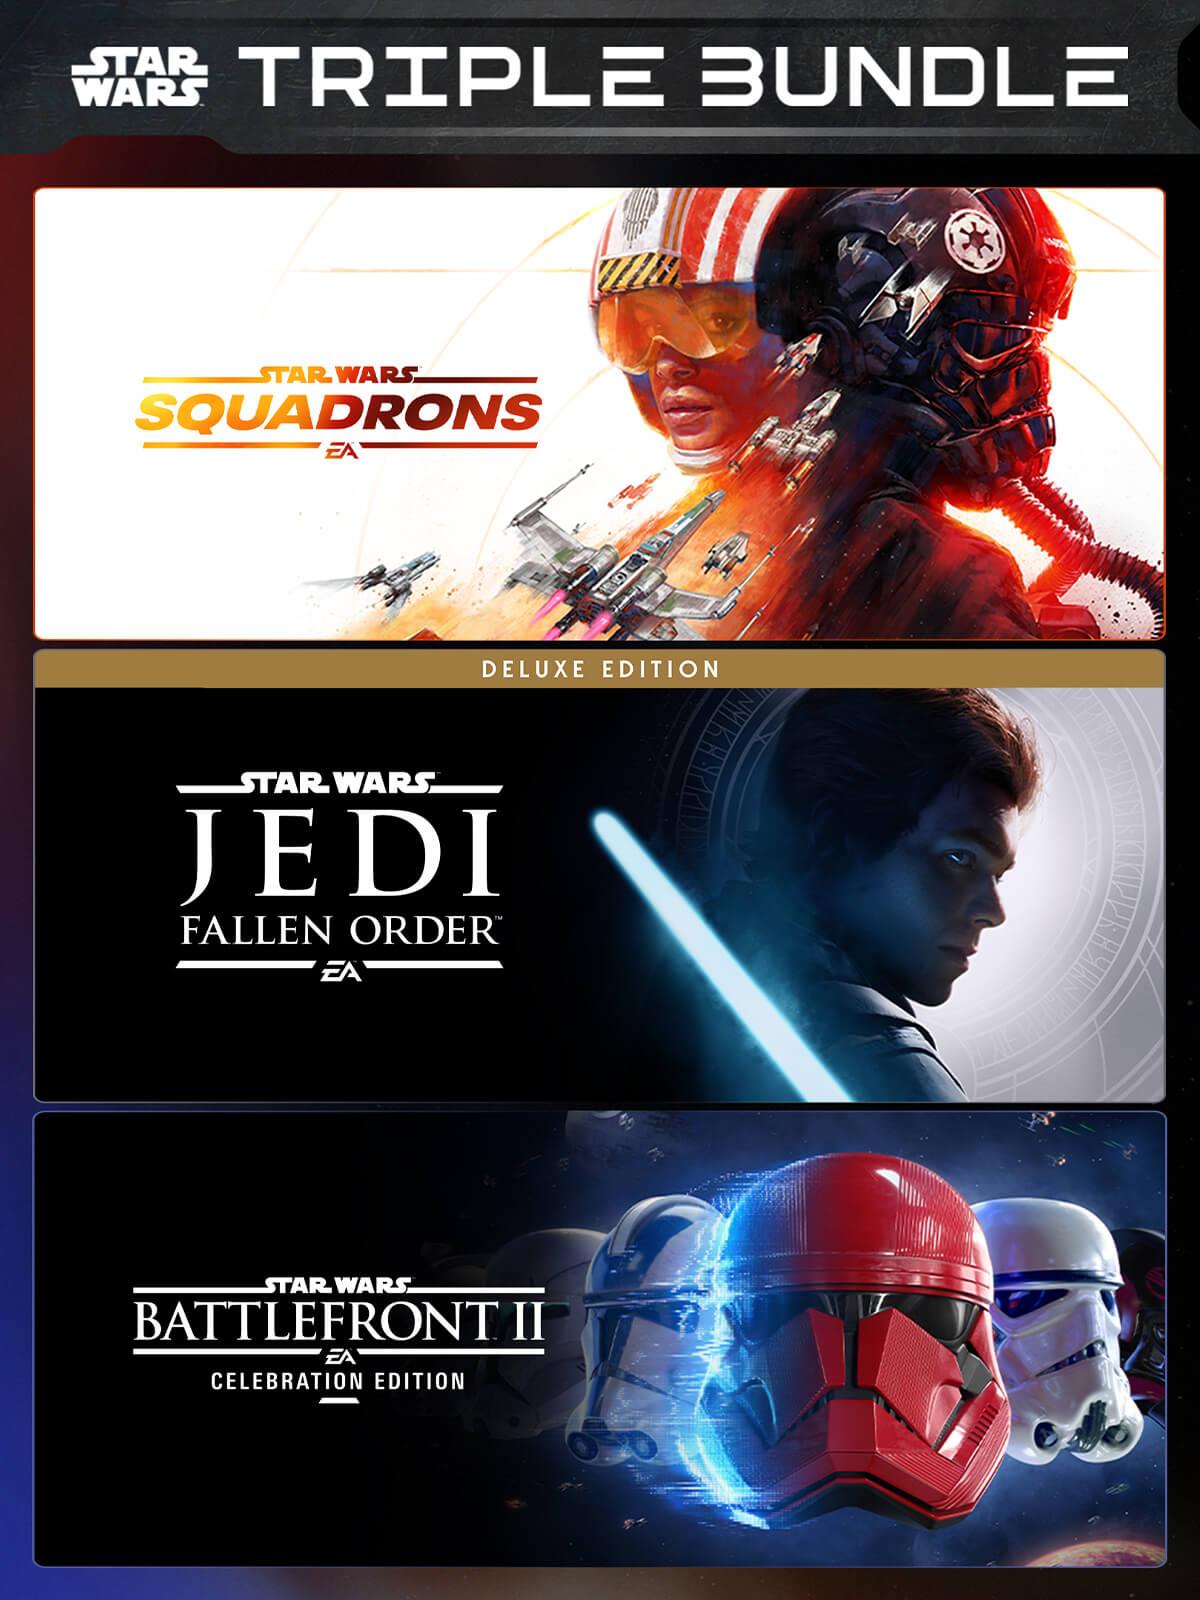 [PC] Star Wars Triple Bundle : Squadrons + Fallen Order Deluxe + Battlefront II Celebration (EPIC / RU - VPN)